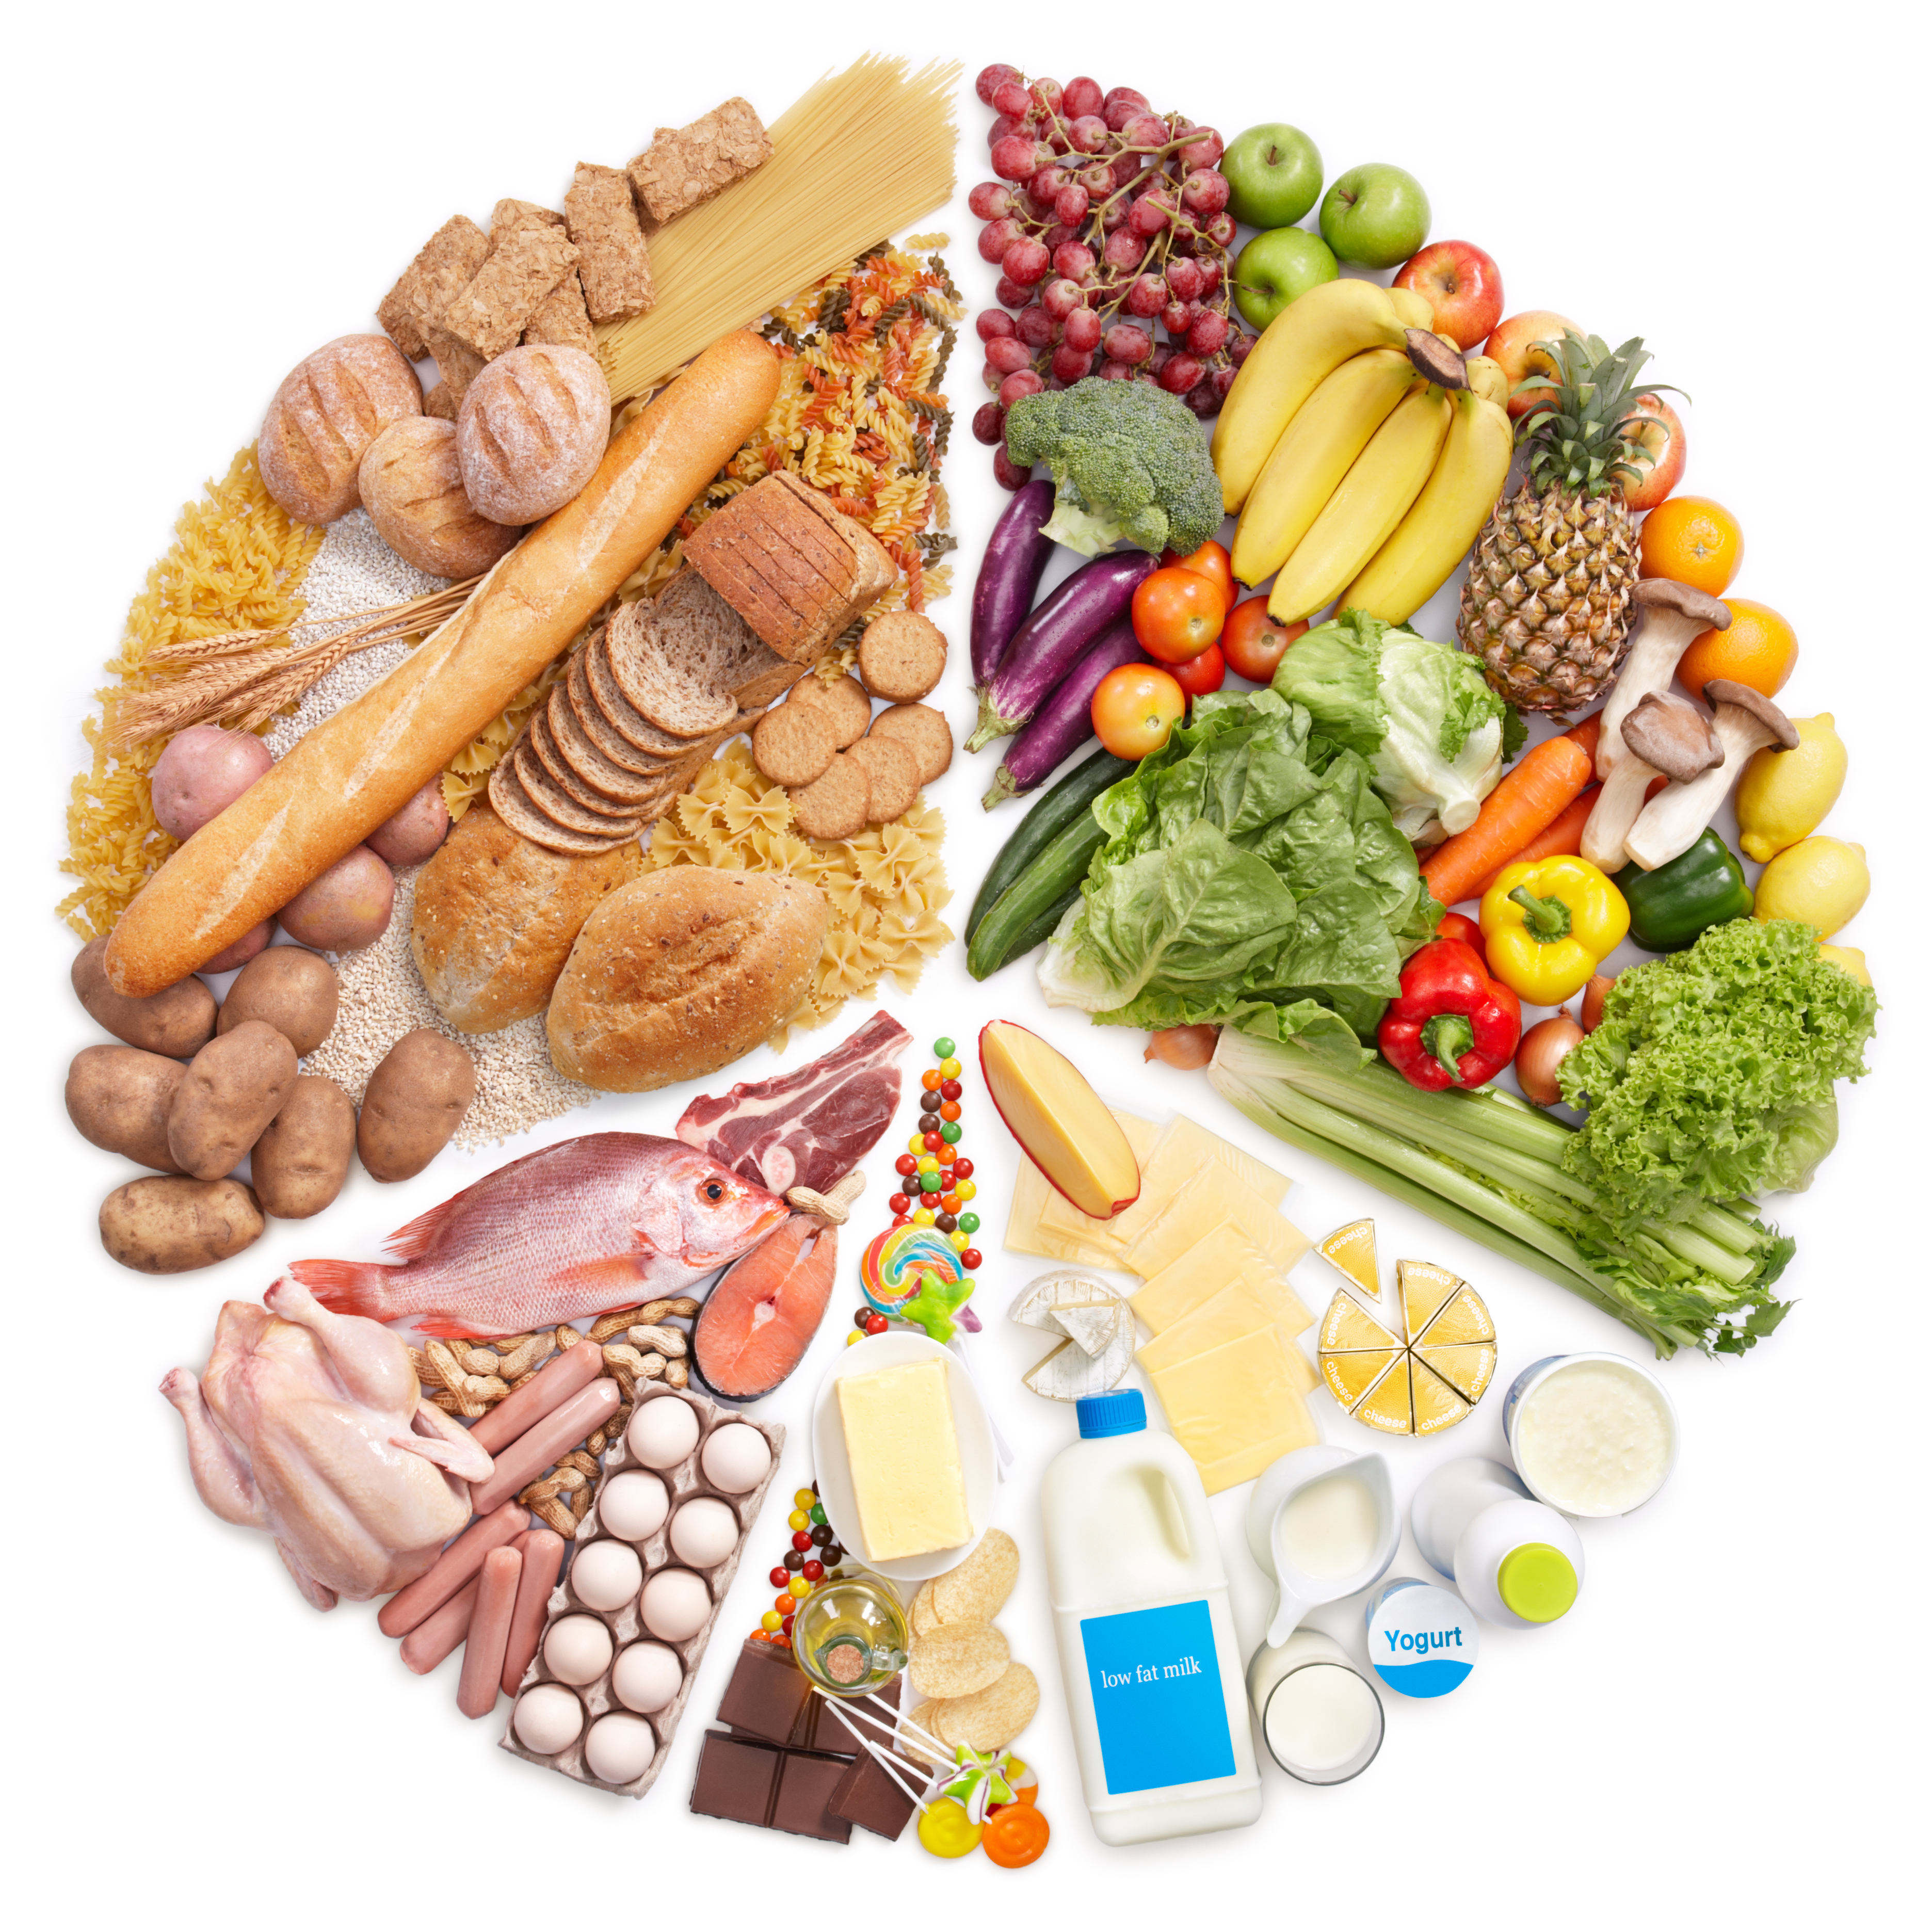 Food, Healthy Eating, Fad Diet, When Did Food Stop Being Normal